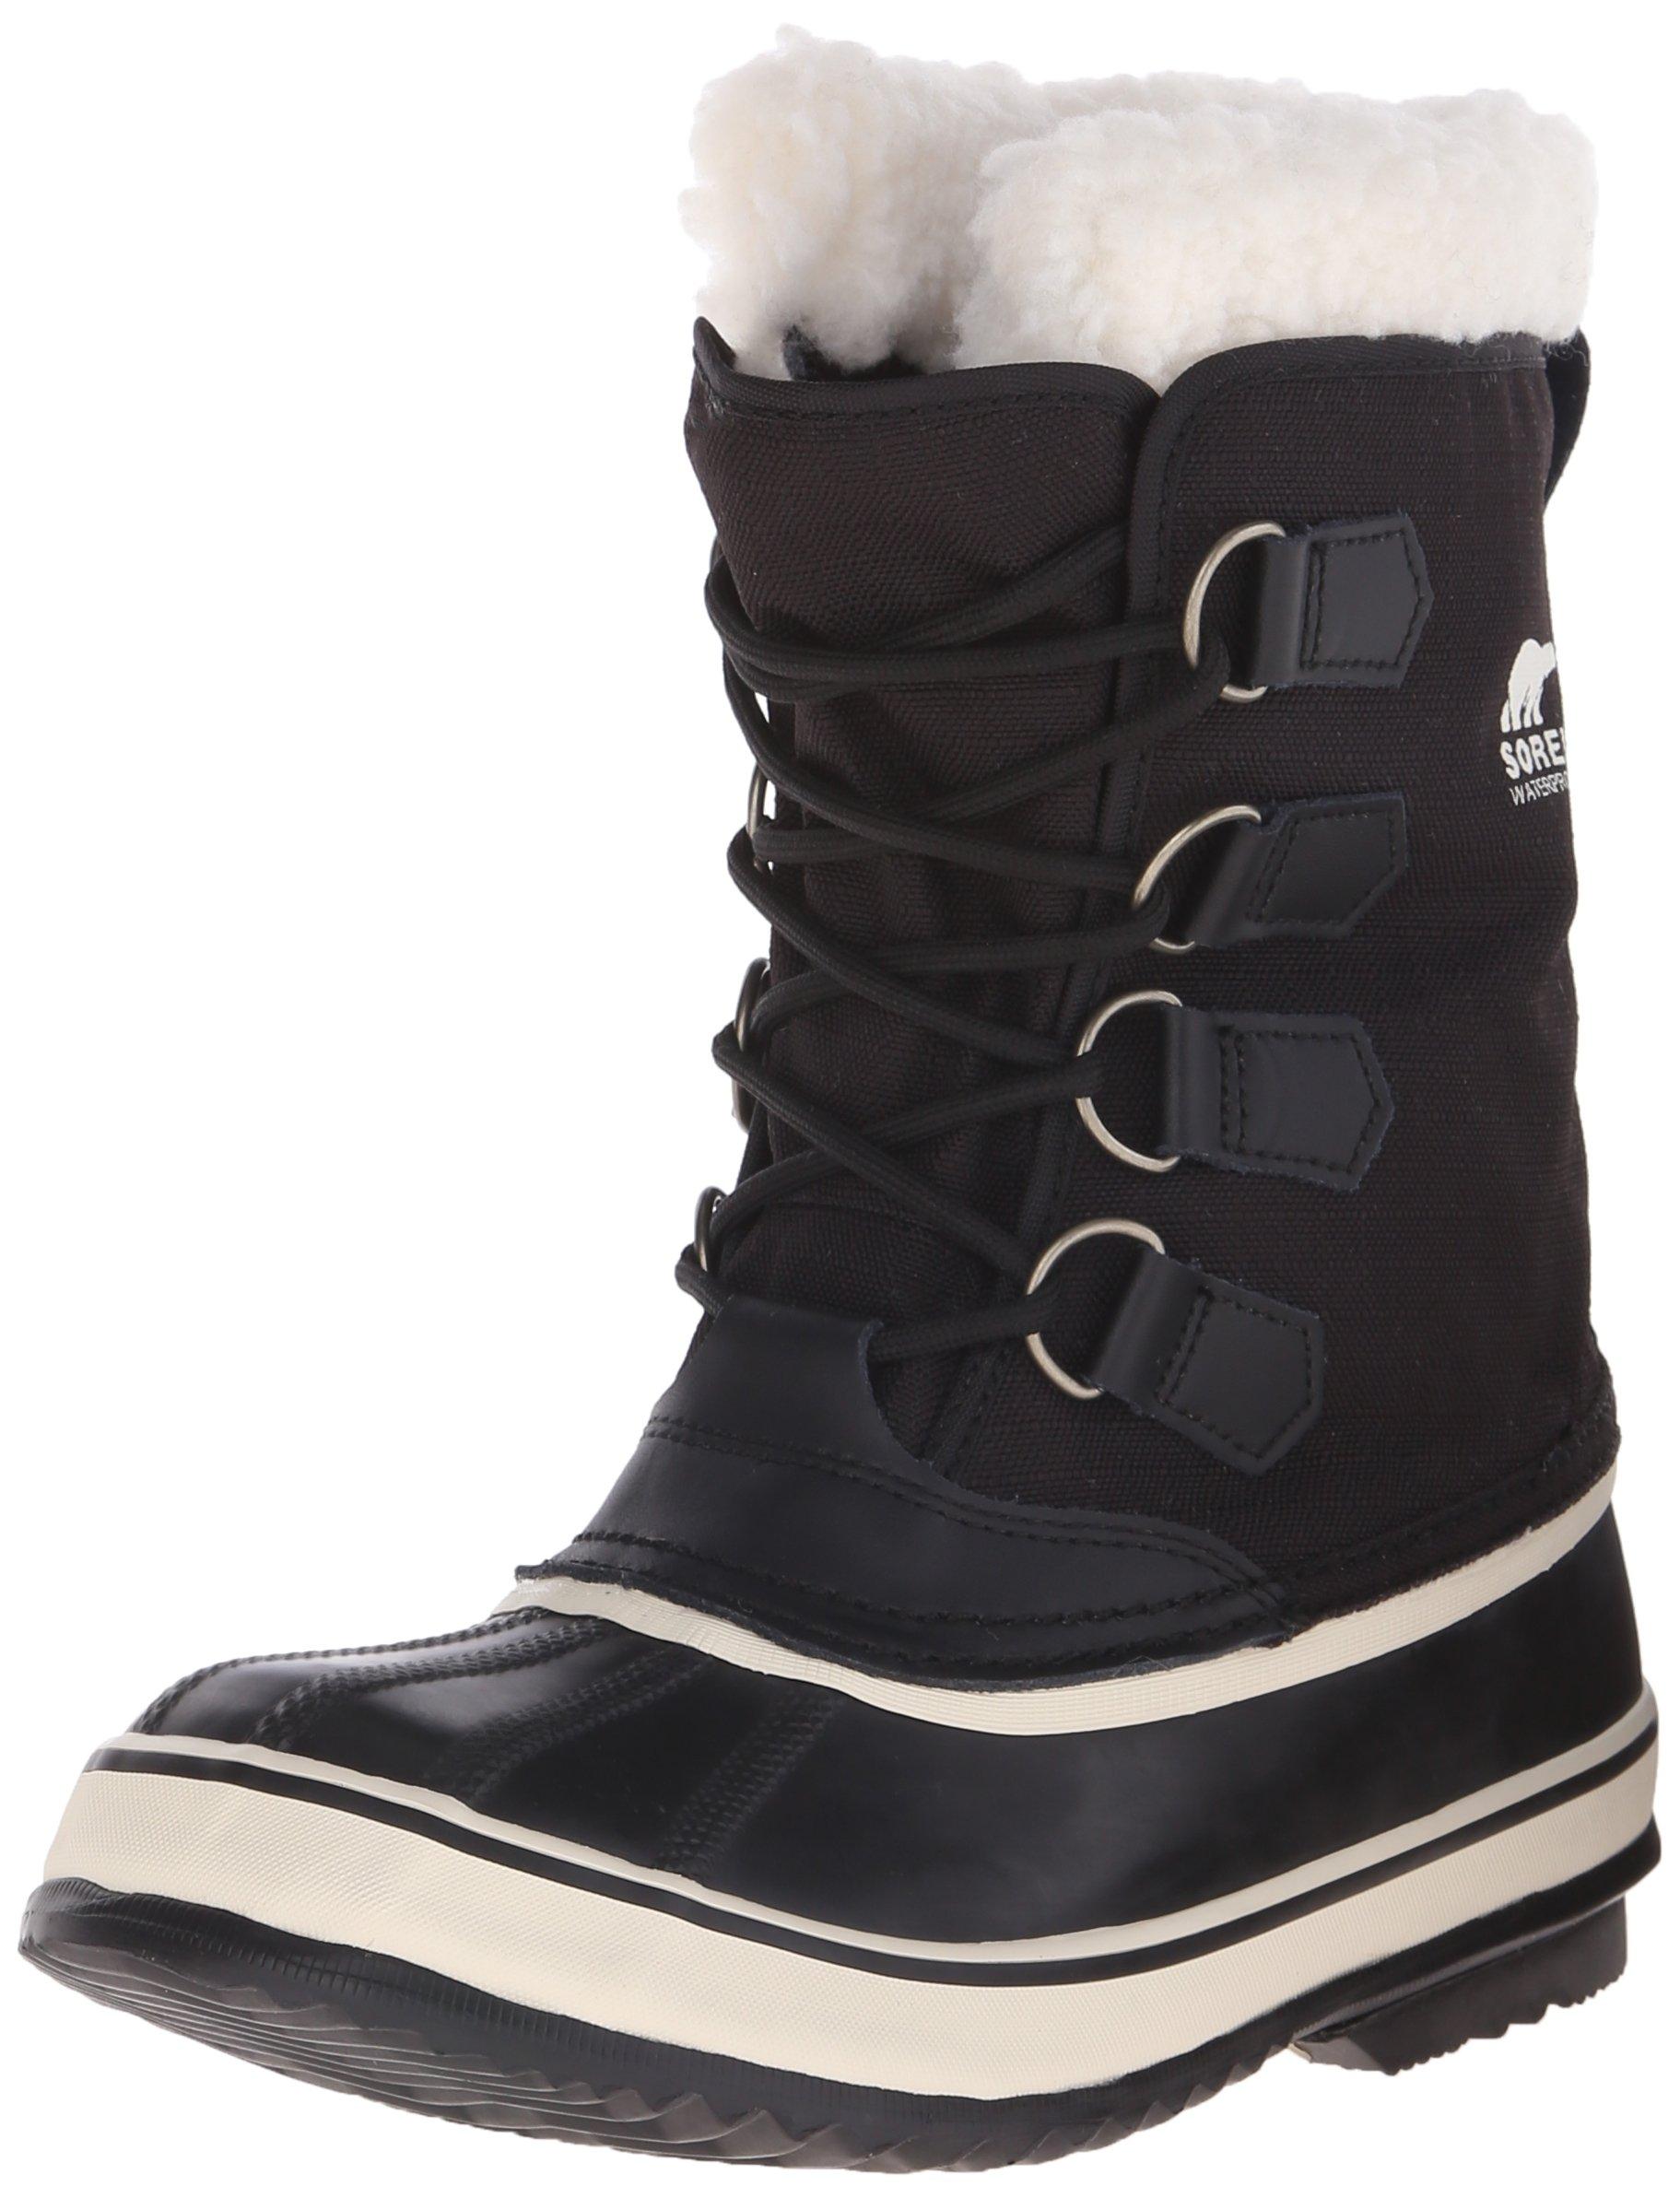 Sorel Women's Winter Carnival Boot,Black/Stone,9 M US by Sorel